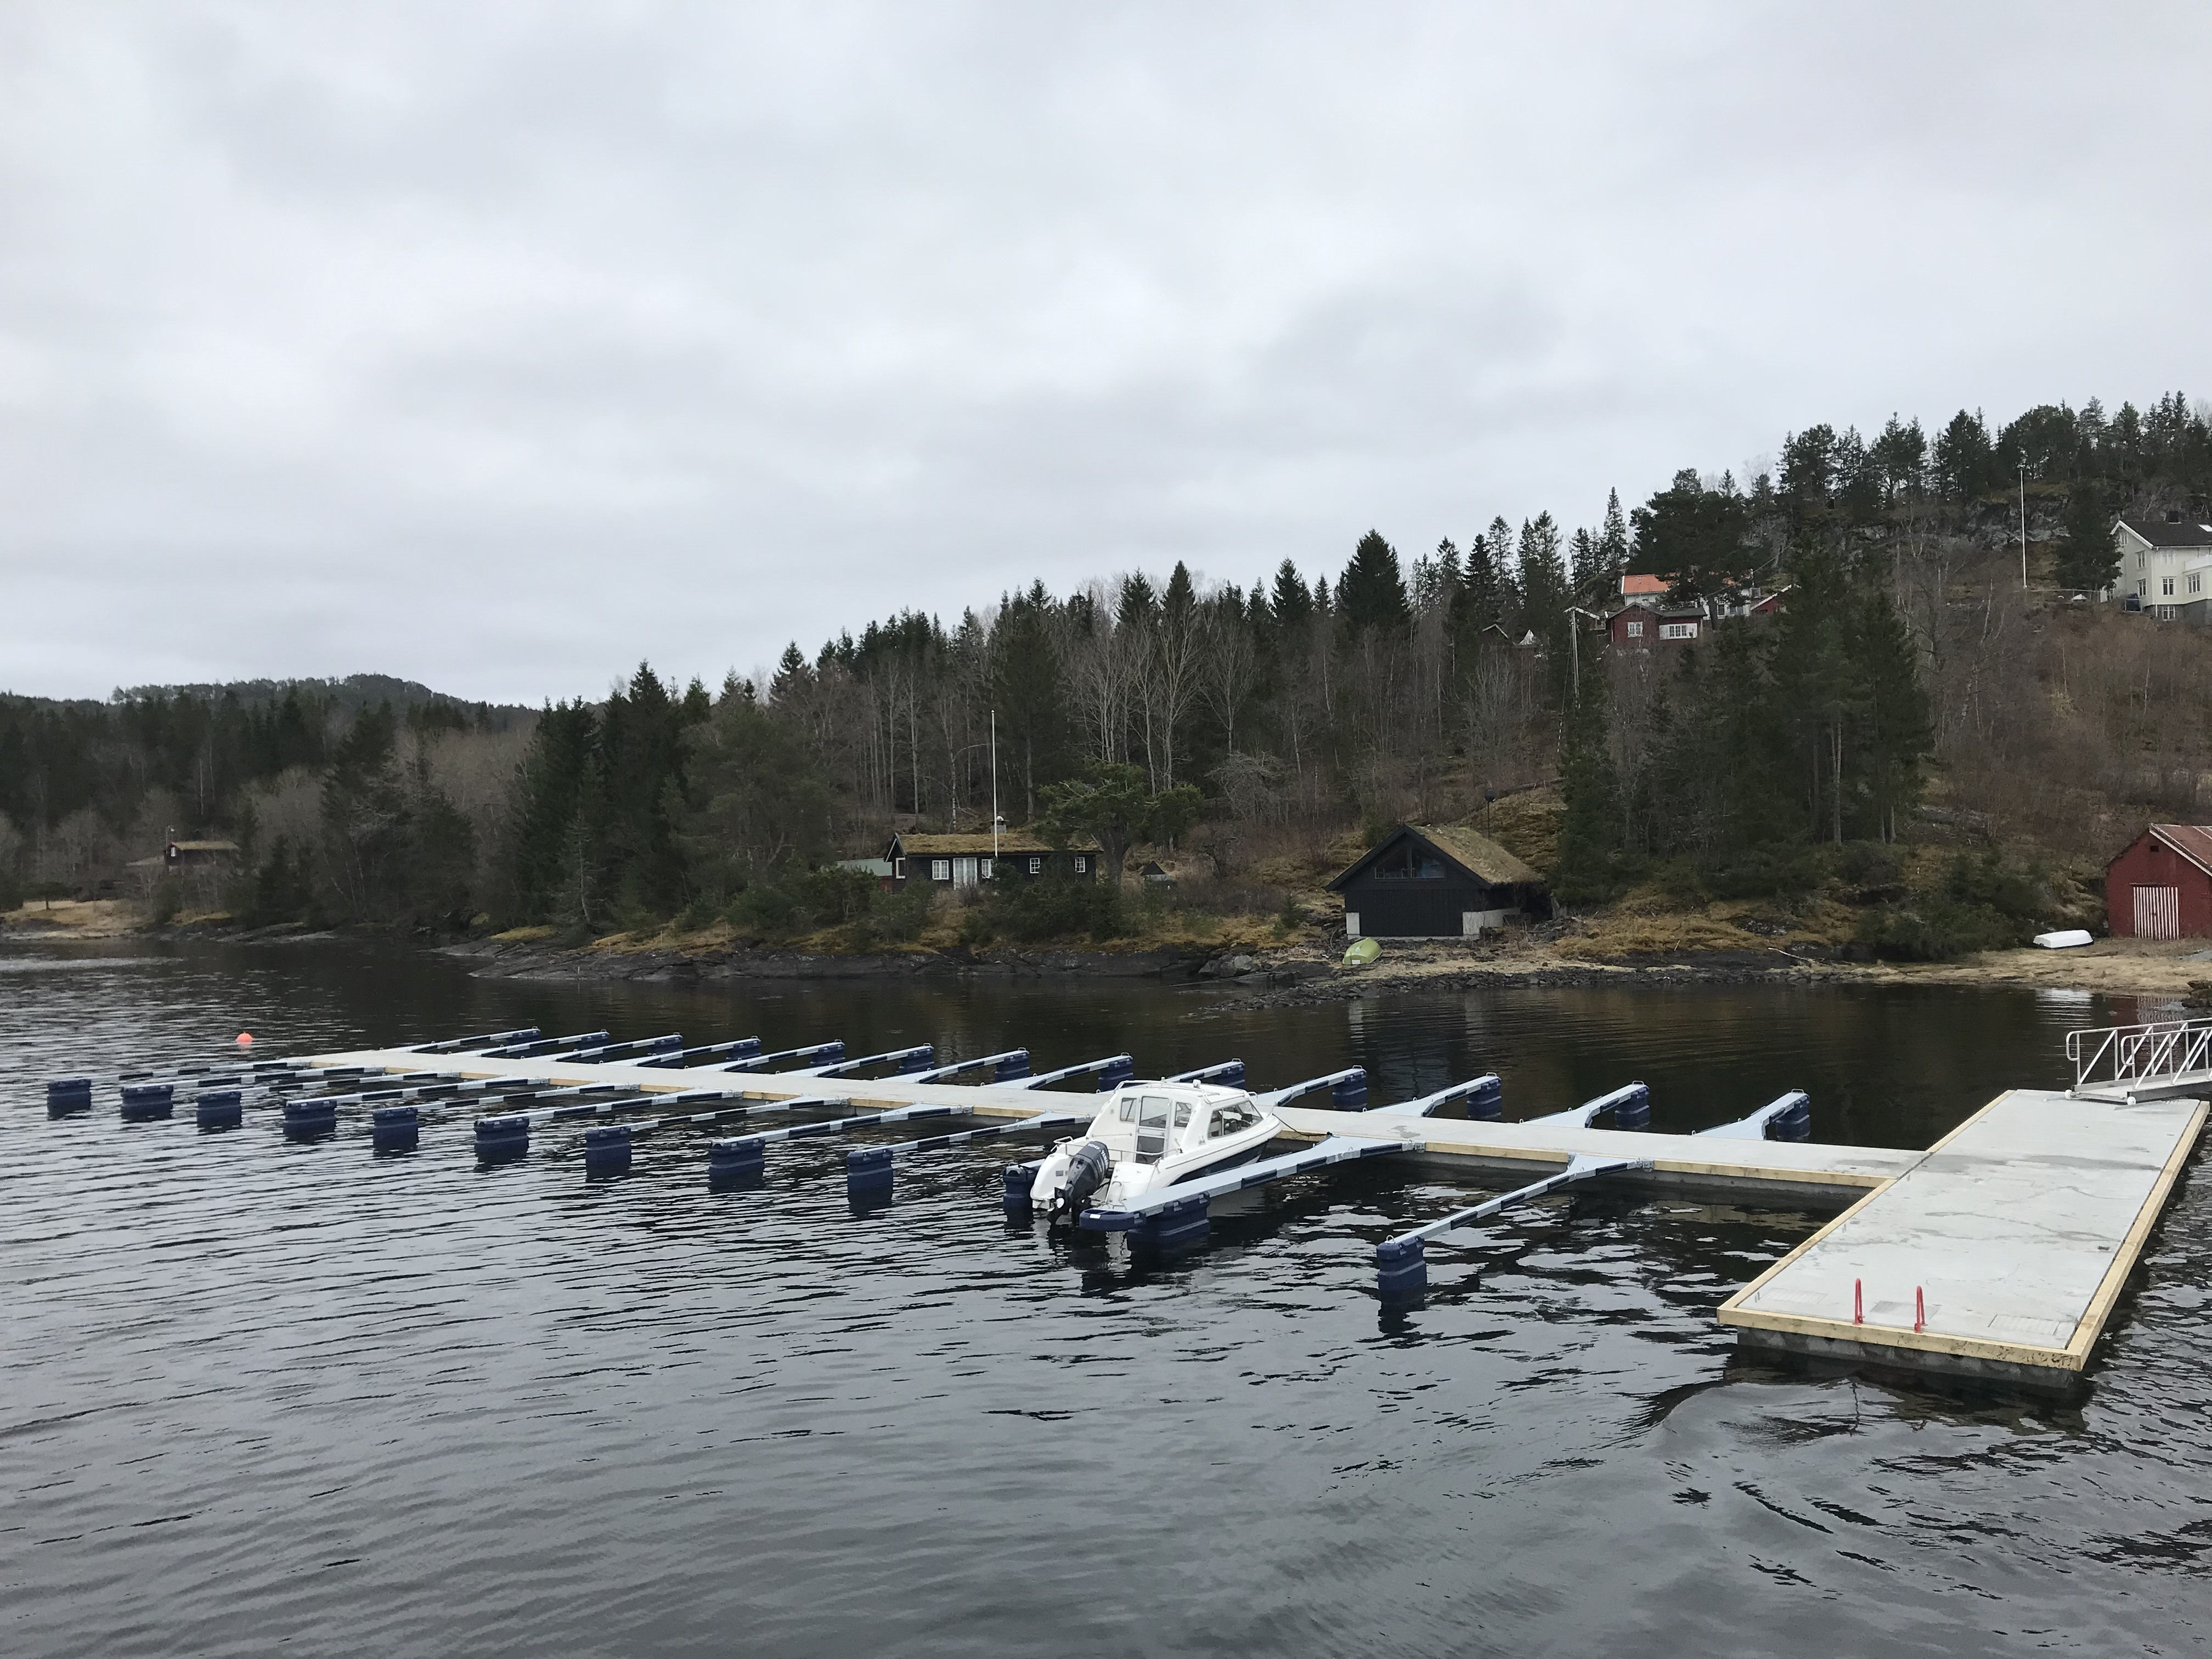 https://marinasolutions.no/uploads/Undli-Kai-Bryggeforening_Åsenfjord-9.jpg